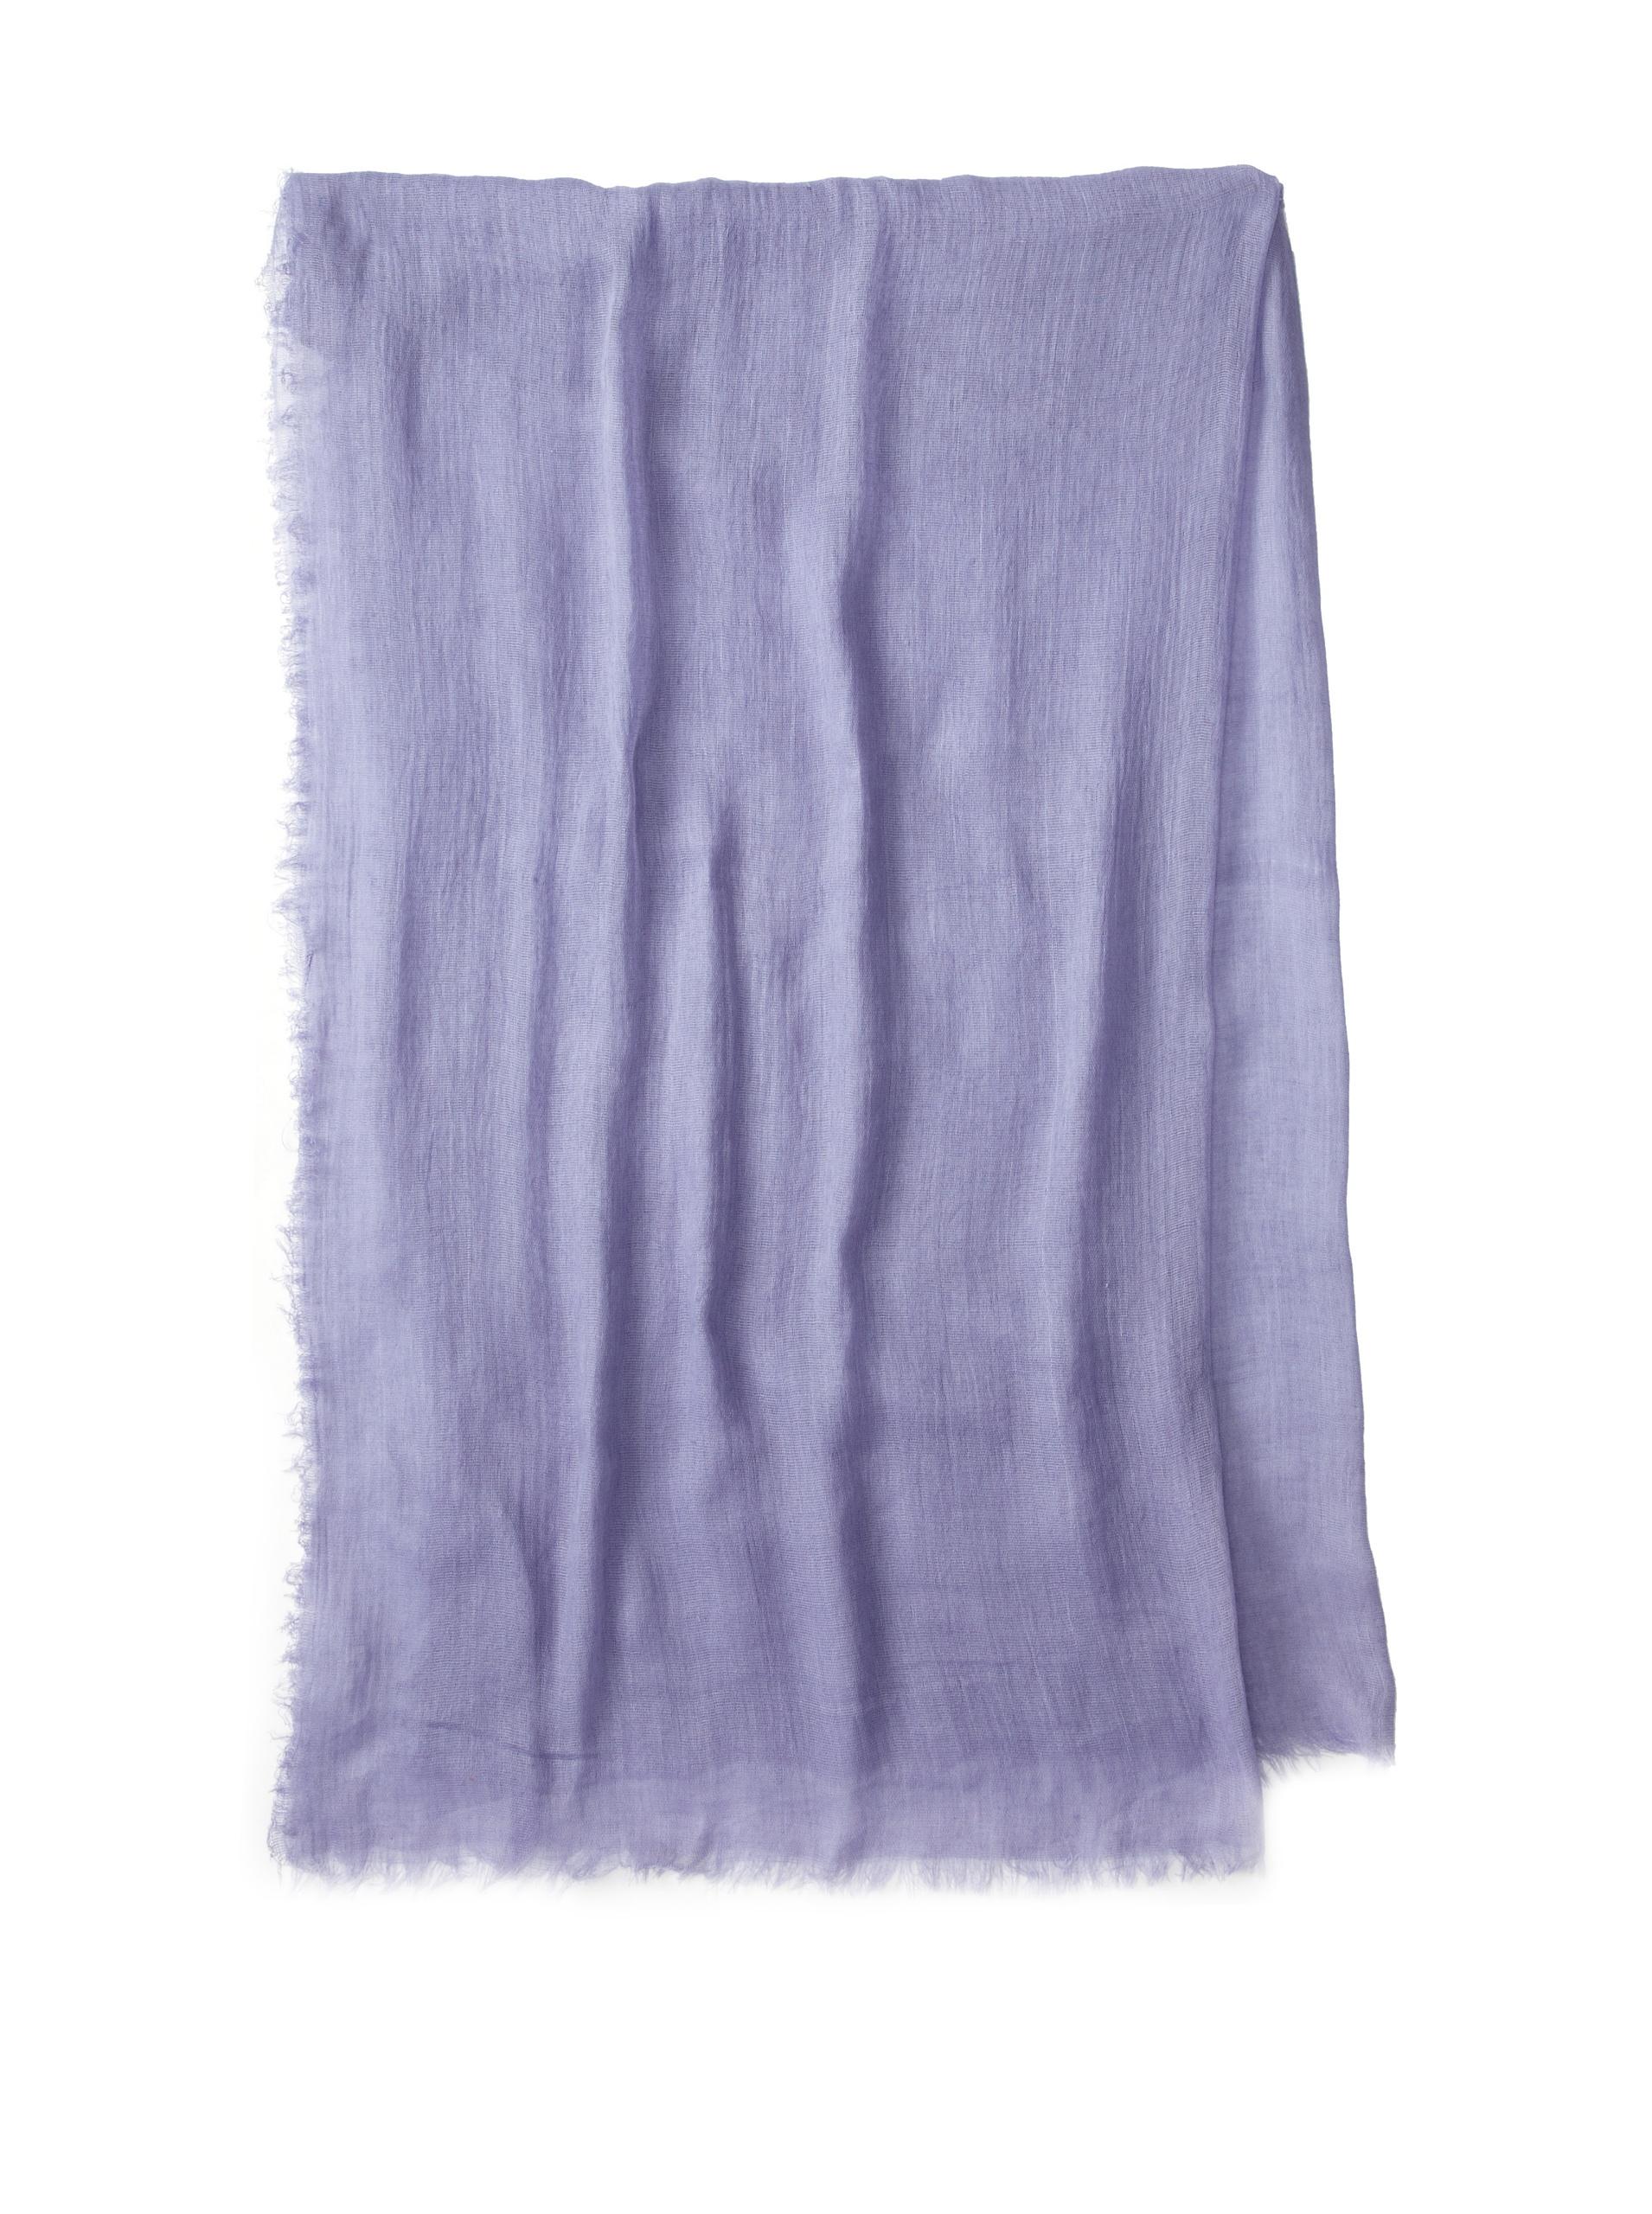 Carolina Amato Women's Cotton Gauze Wrap (Periwinkle)